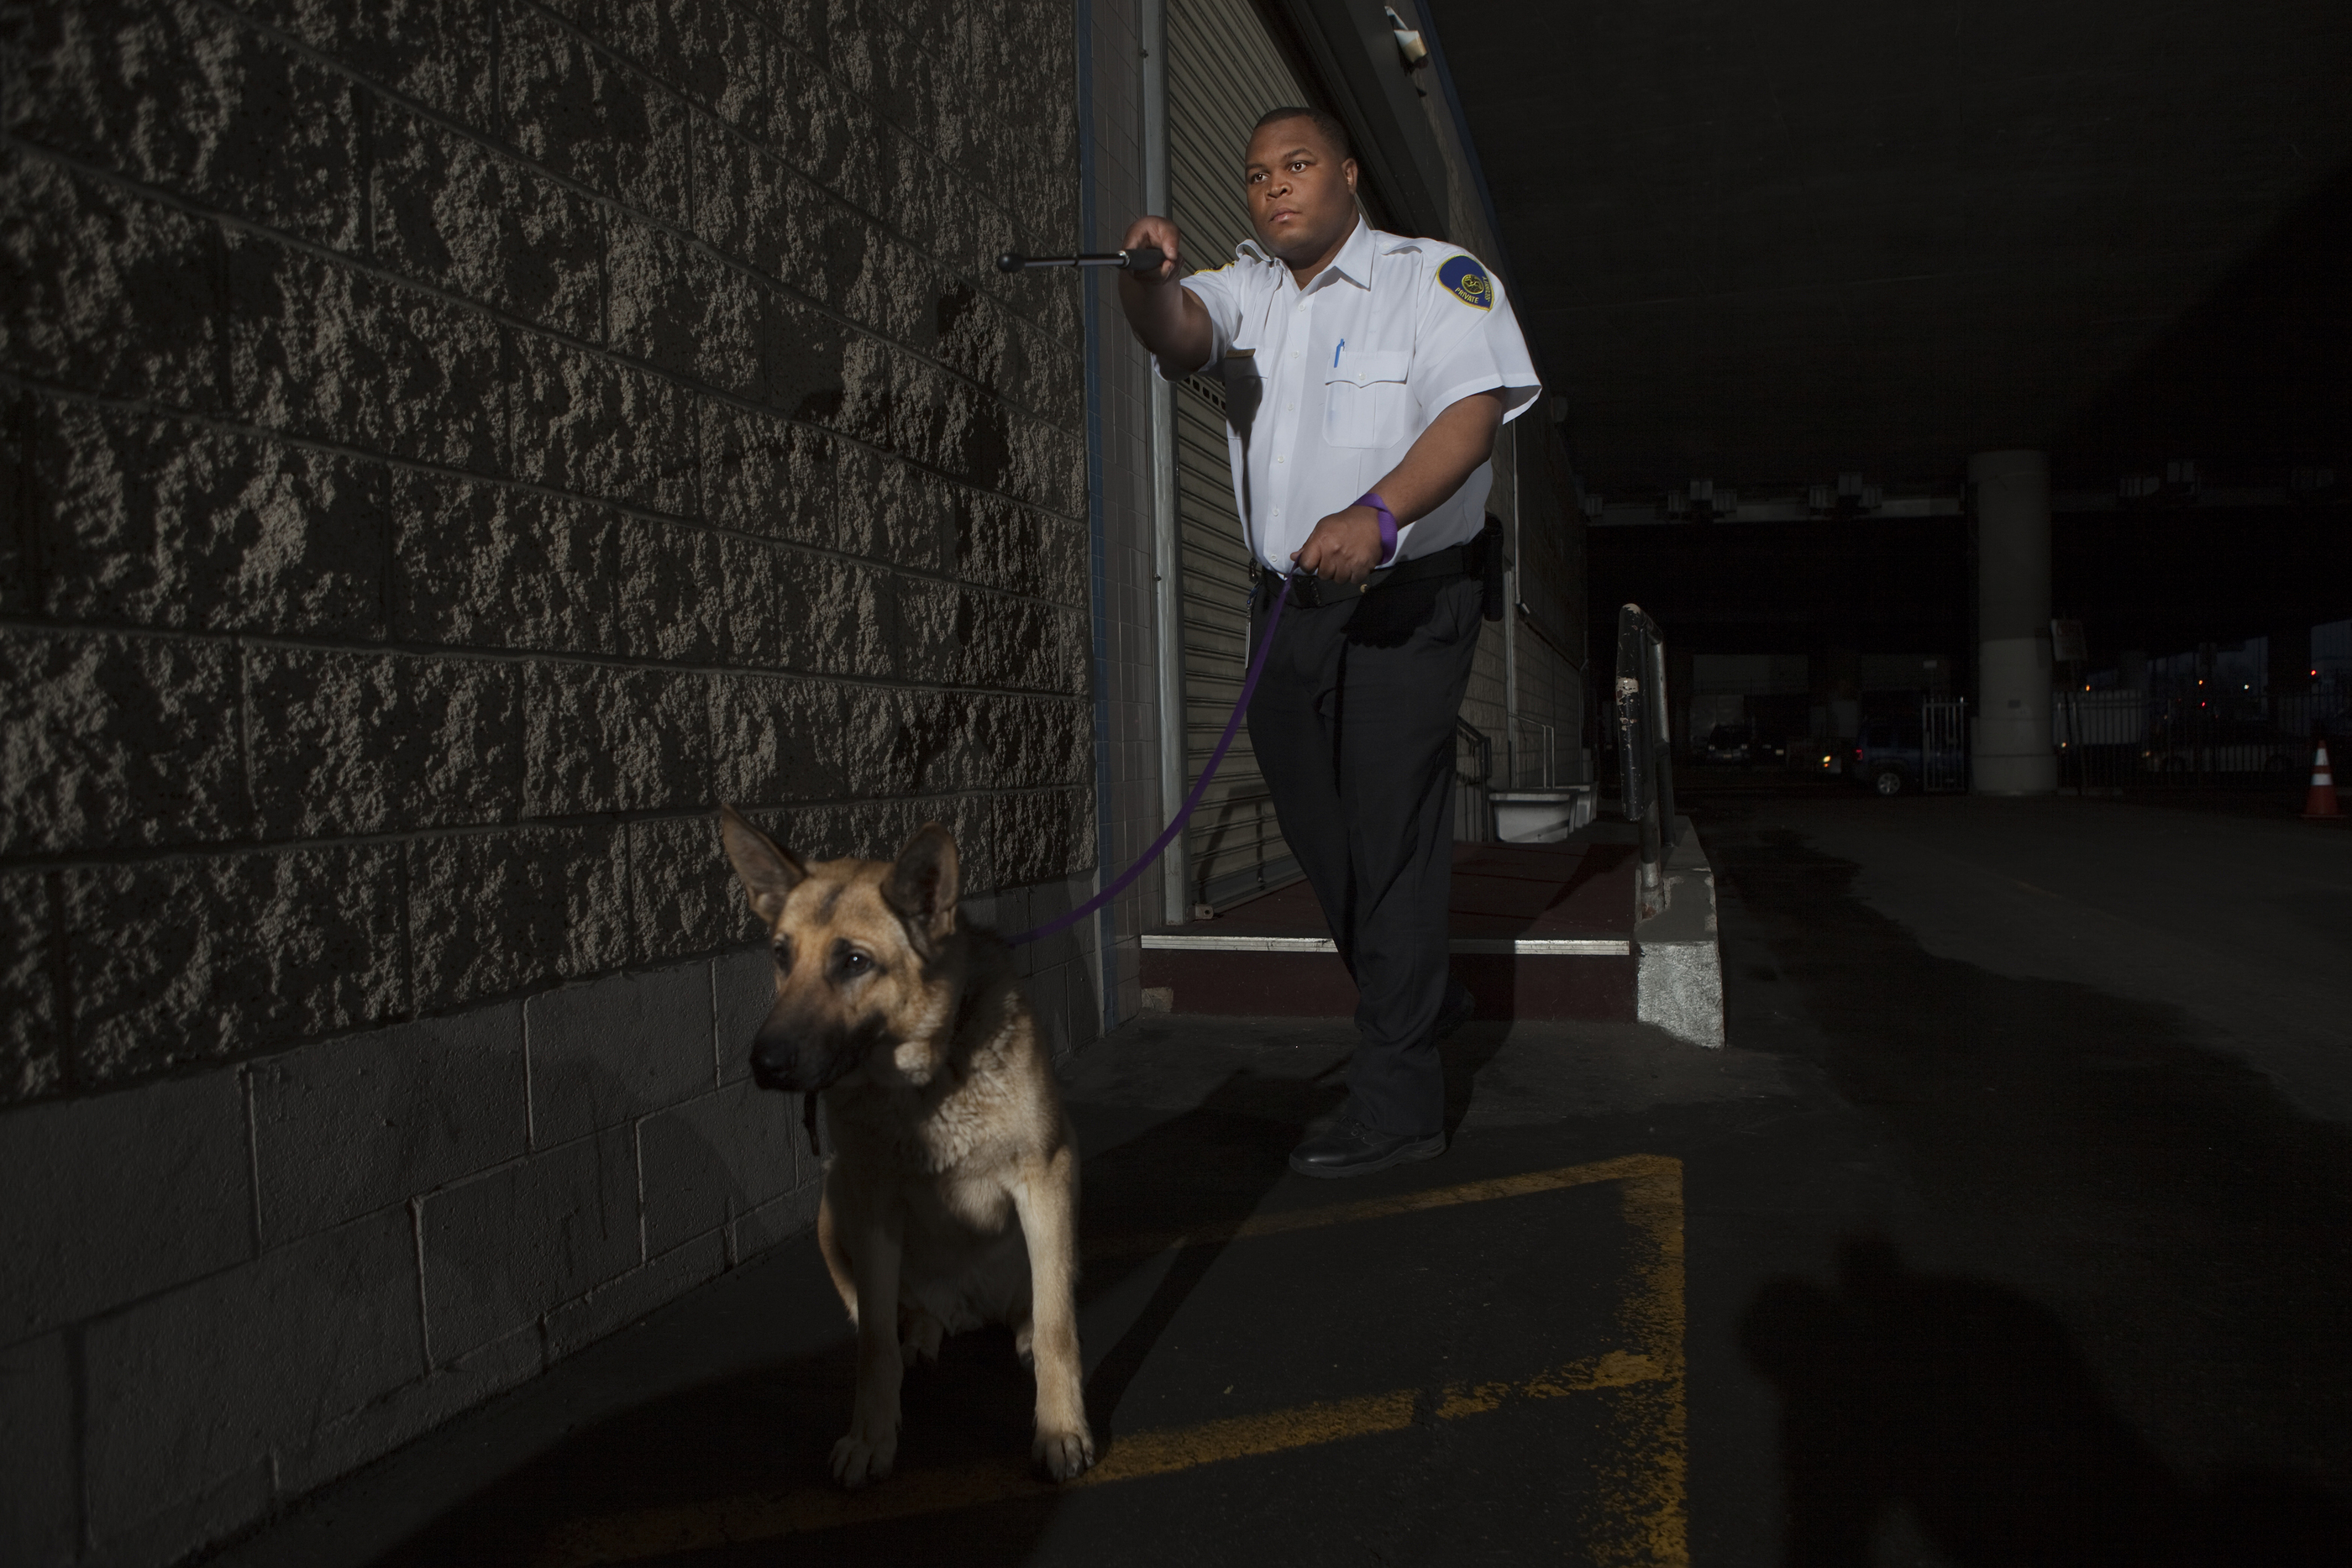 Security guard with dog patrols on duty.jpg